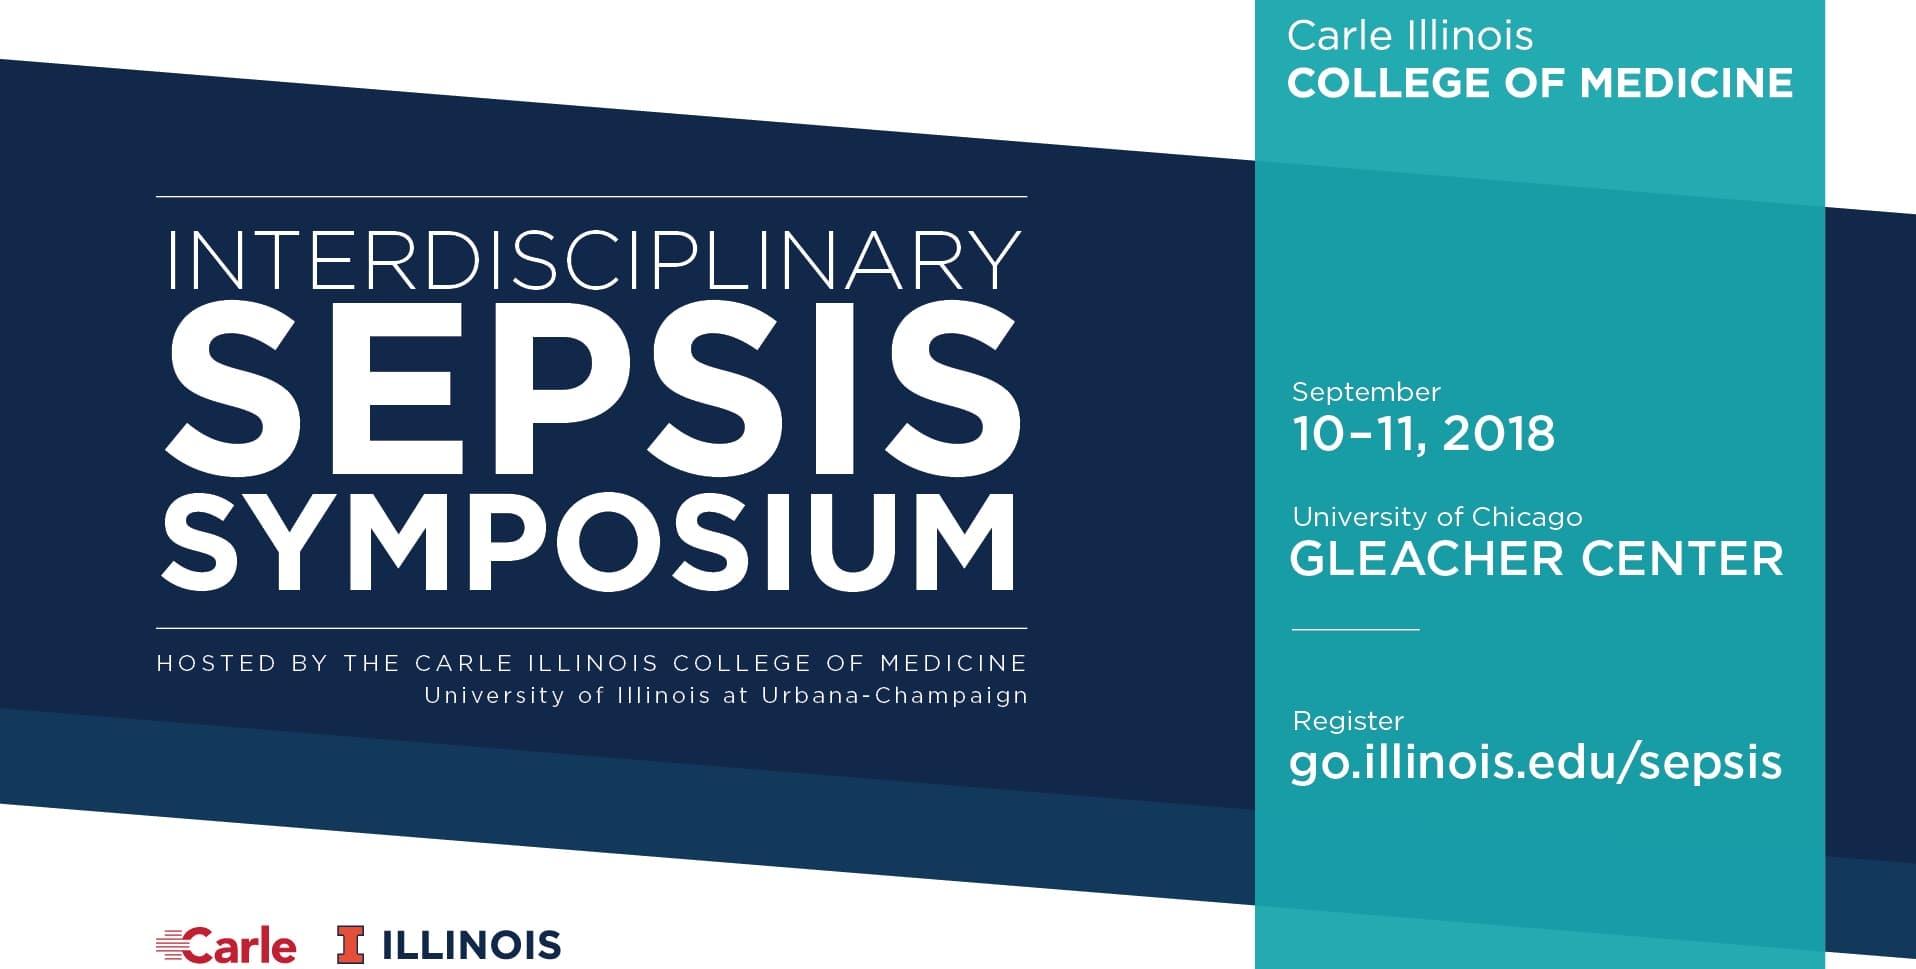 Interdisciplinary Sepsis Symposium Digital.jpg